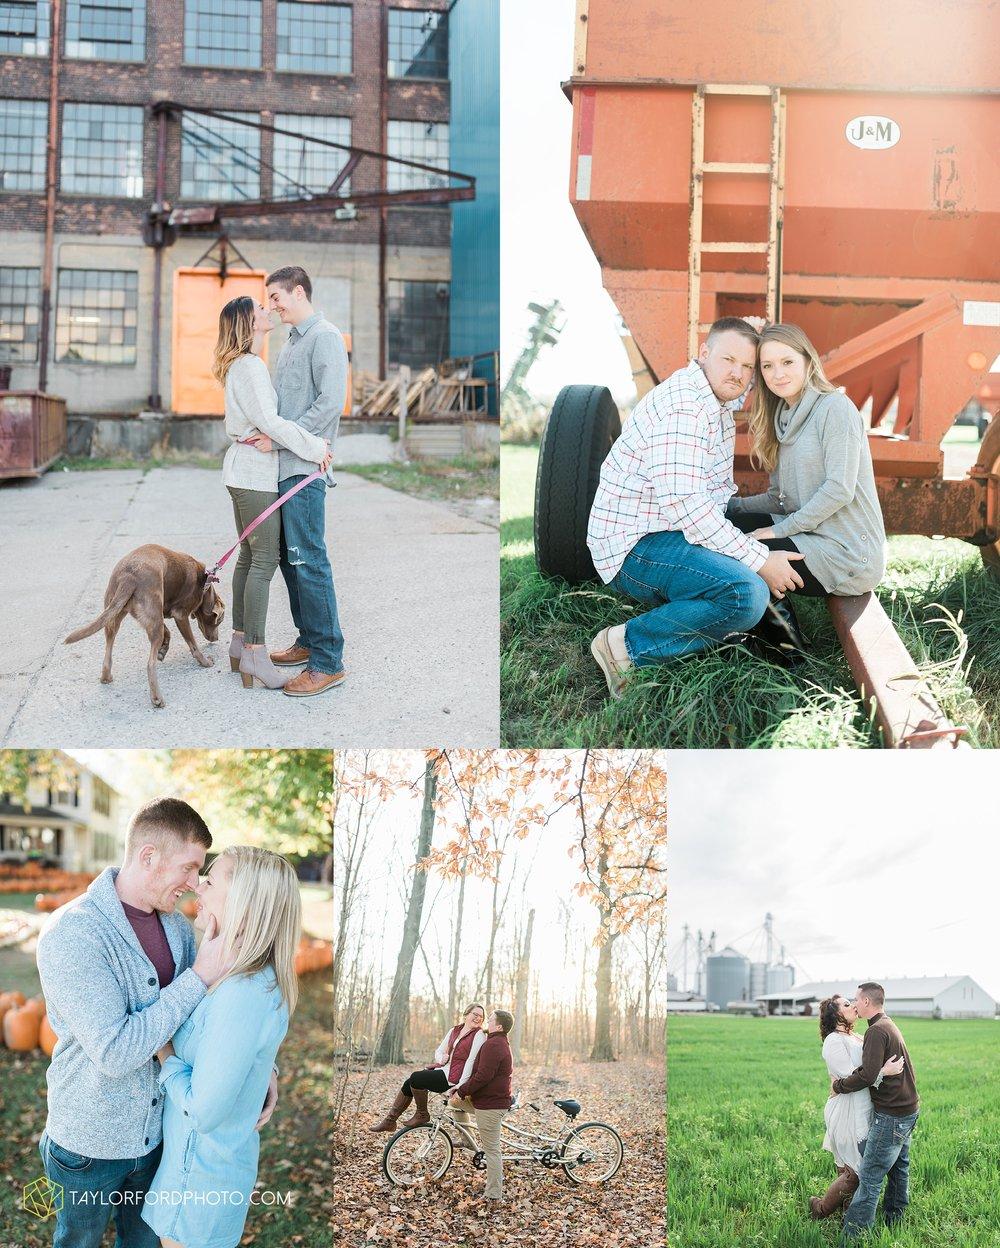 van-wert-ohio-fort-wayne-indiana-photographer-Taylor-Ford-Photography-wedding-engagement-family-senior_4416.jpg